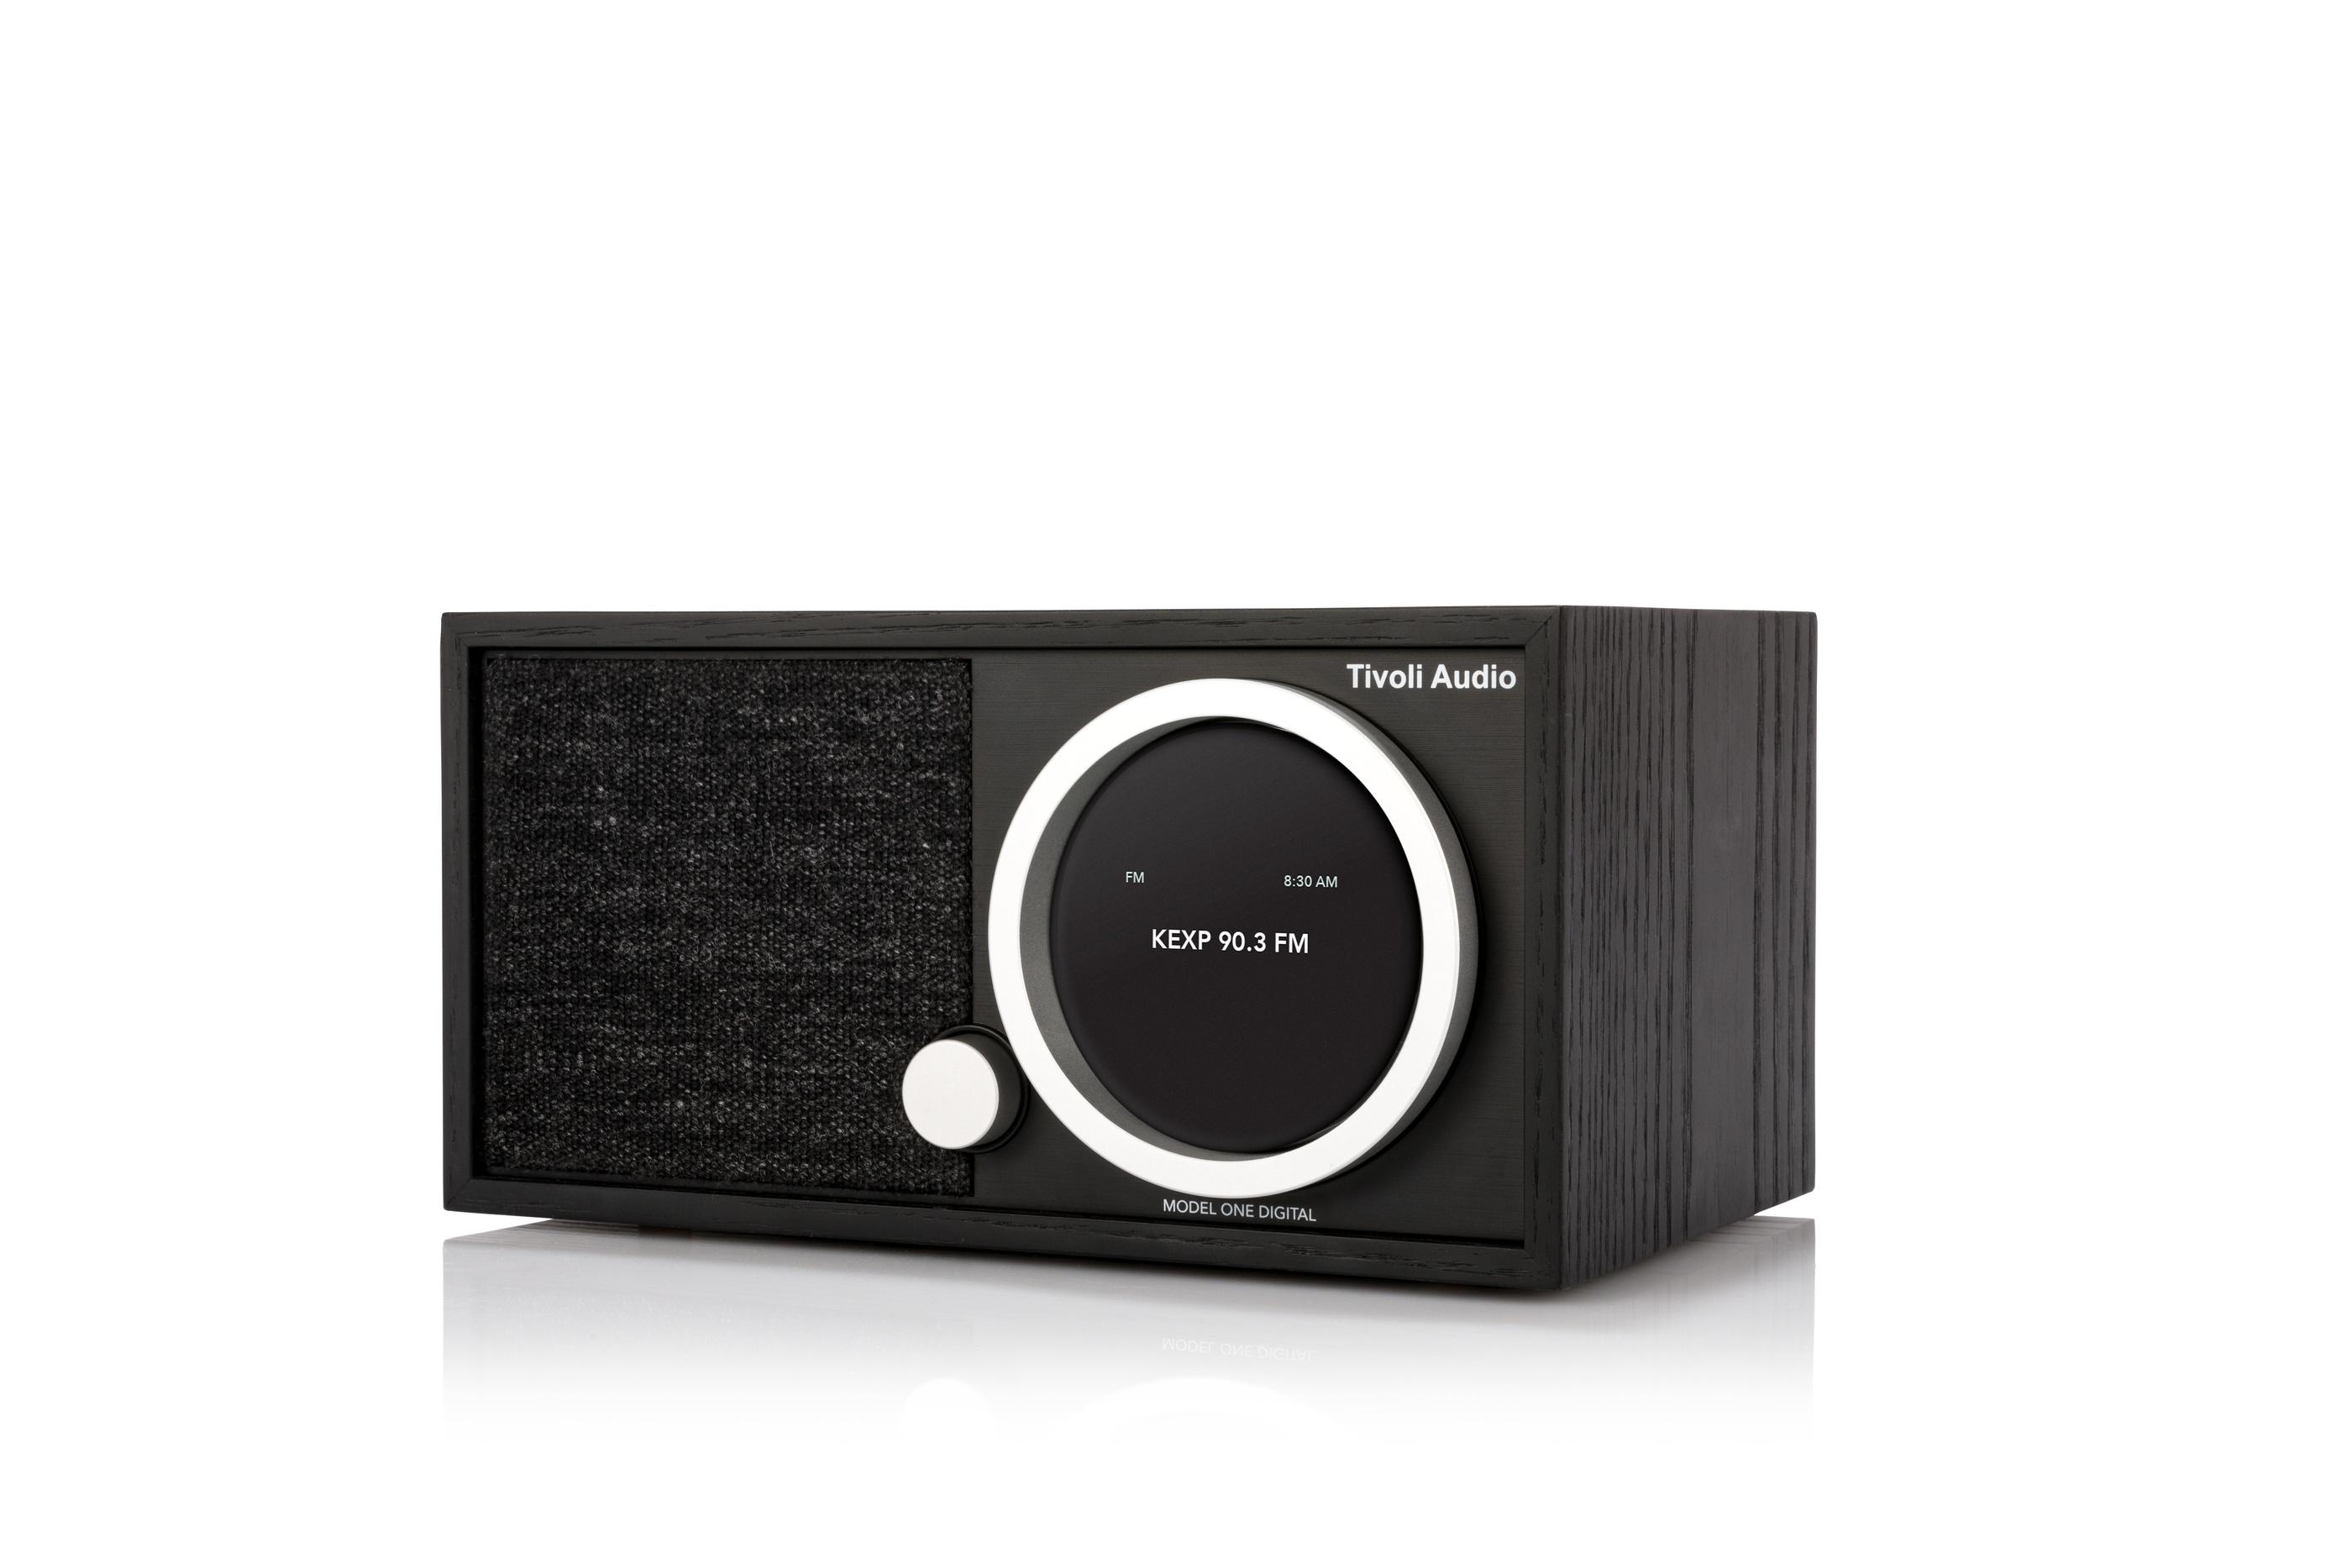 Tivoli Audio Model One+ 2Gen With Bluetooth & Wi-Fi /DAB+ - Black